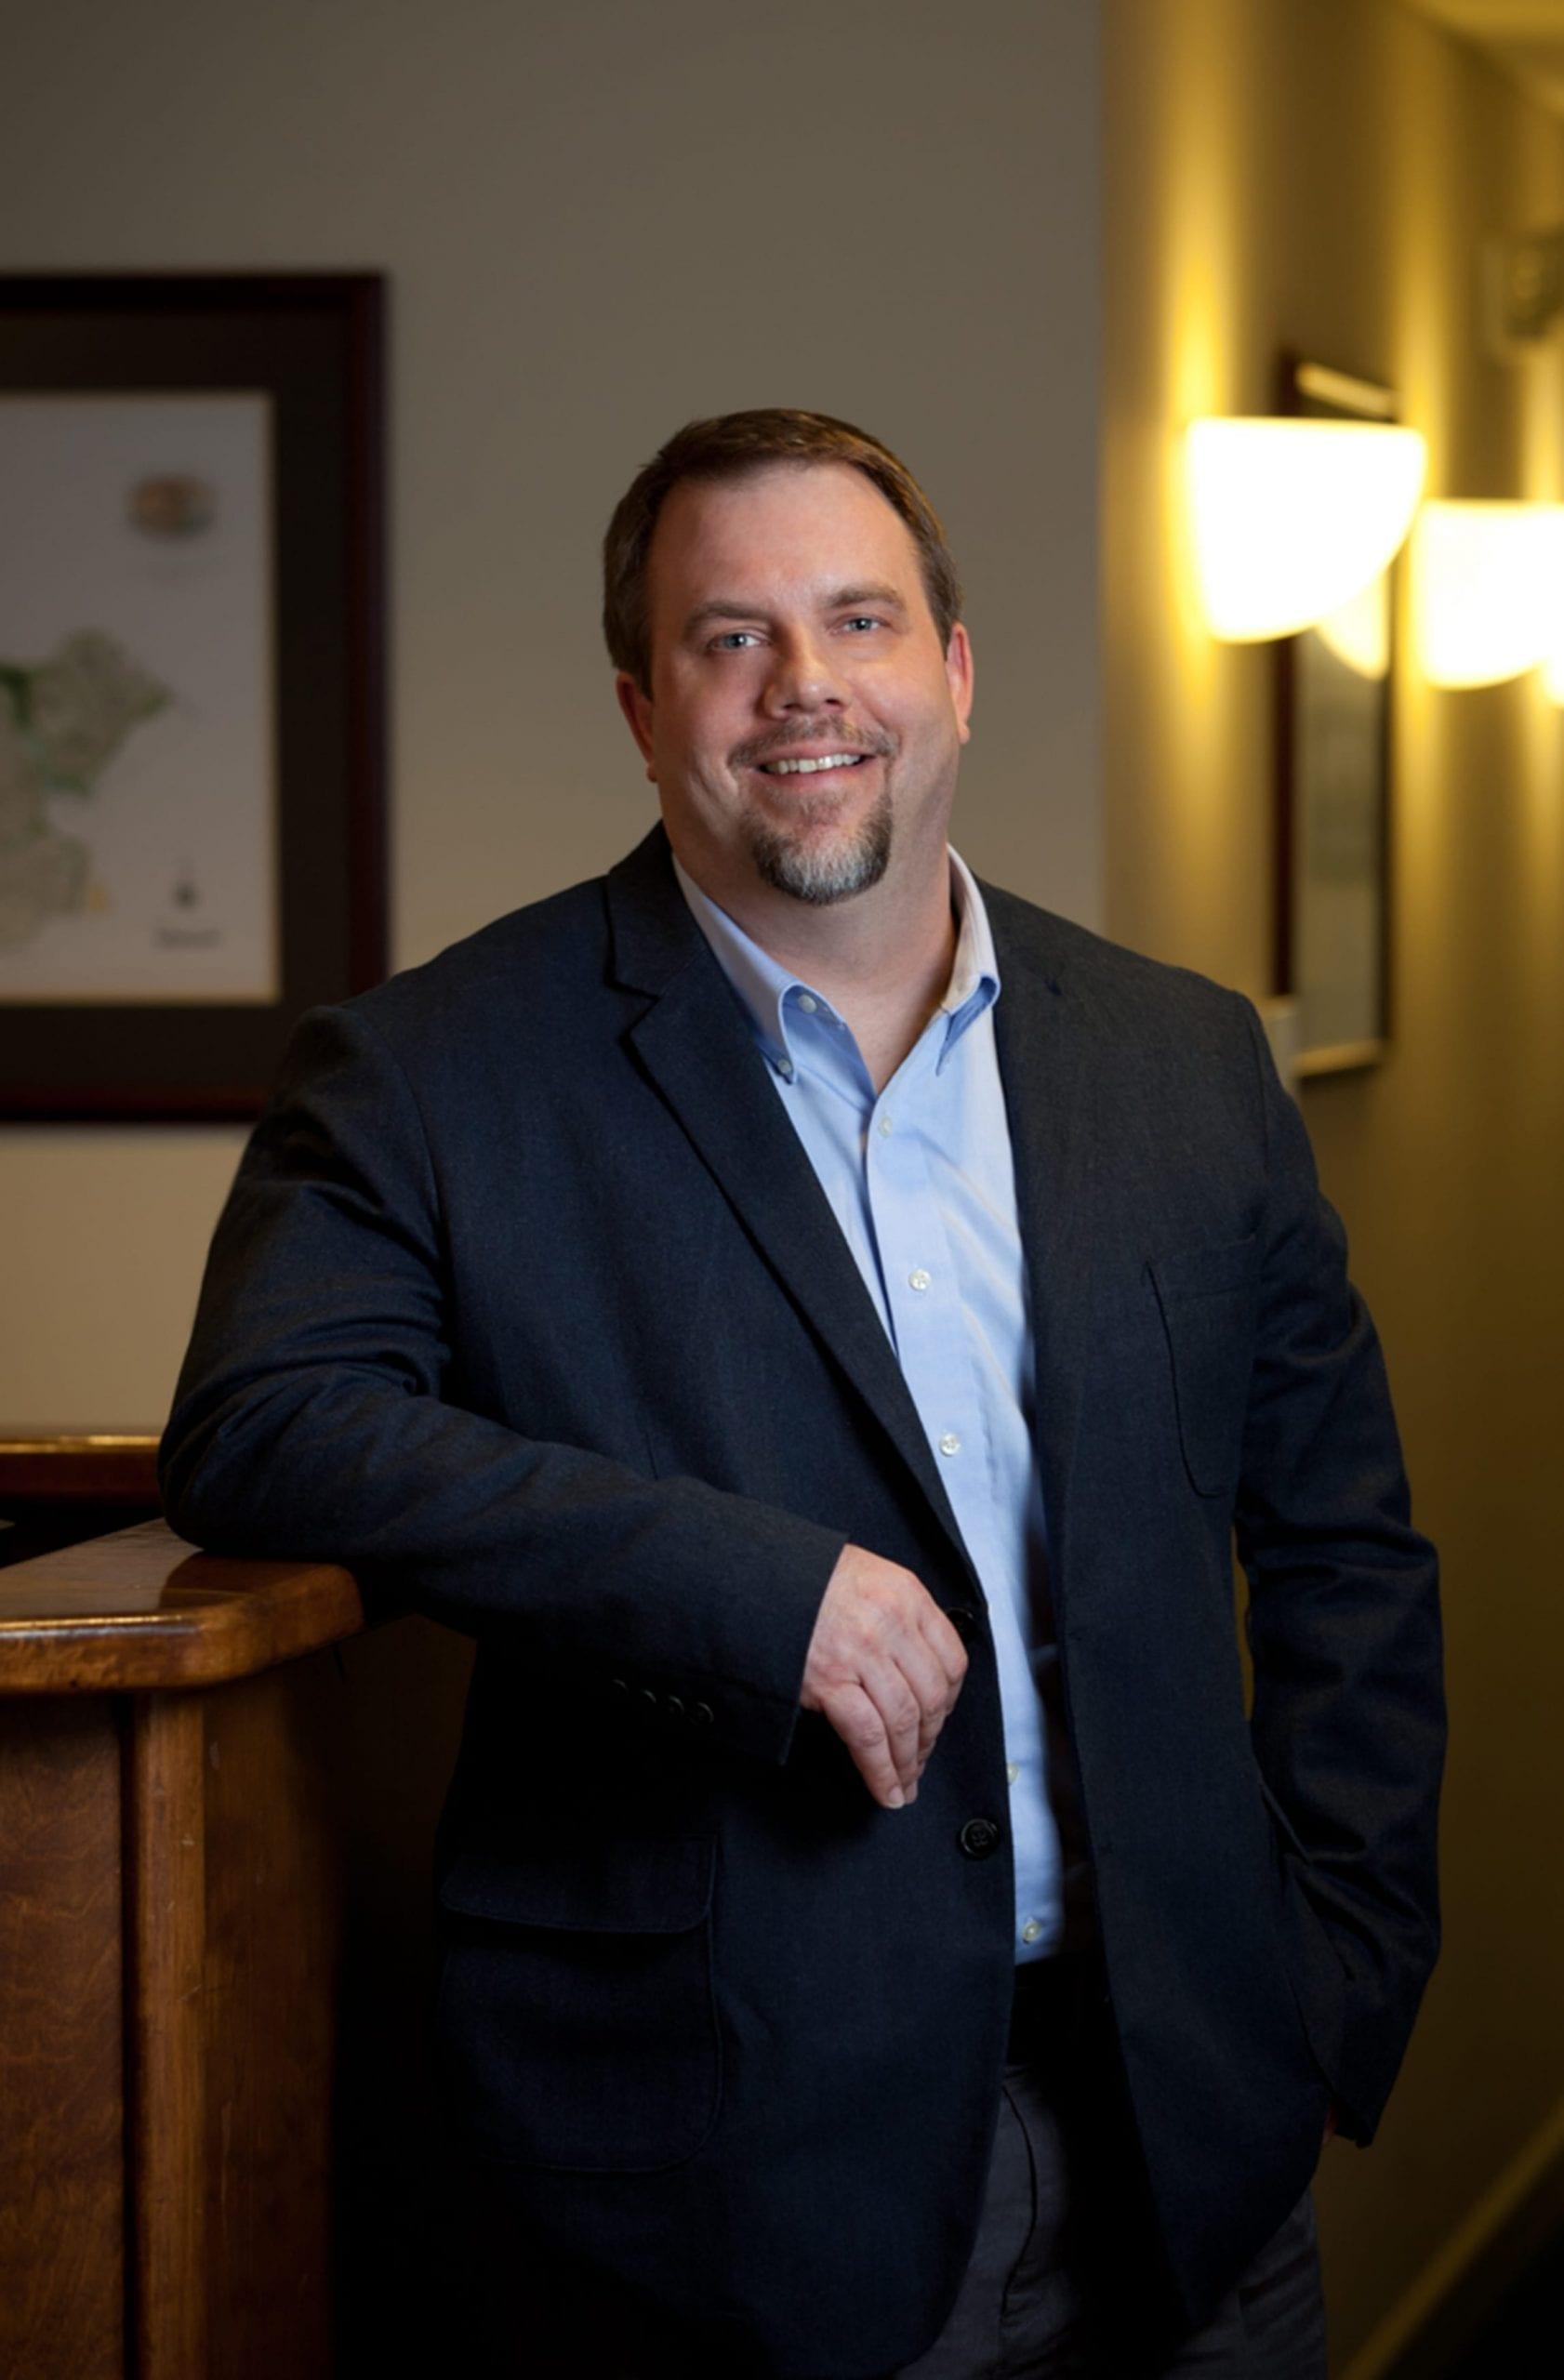 Project Manager Paul Tschiderer, P.E.